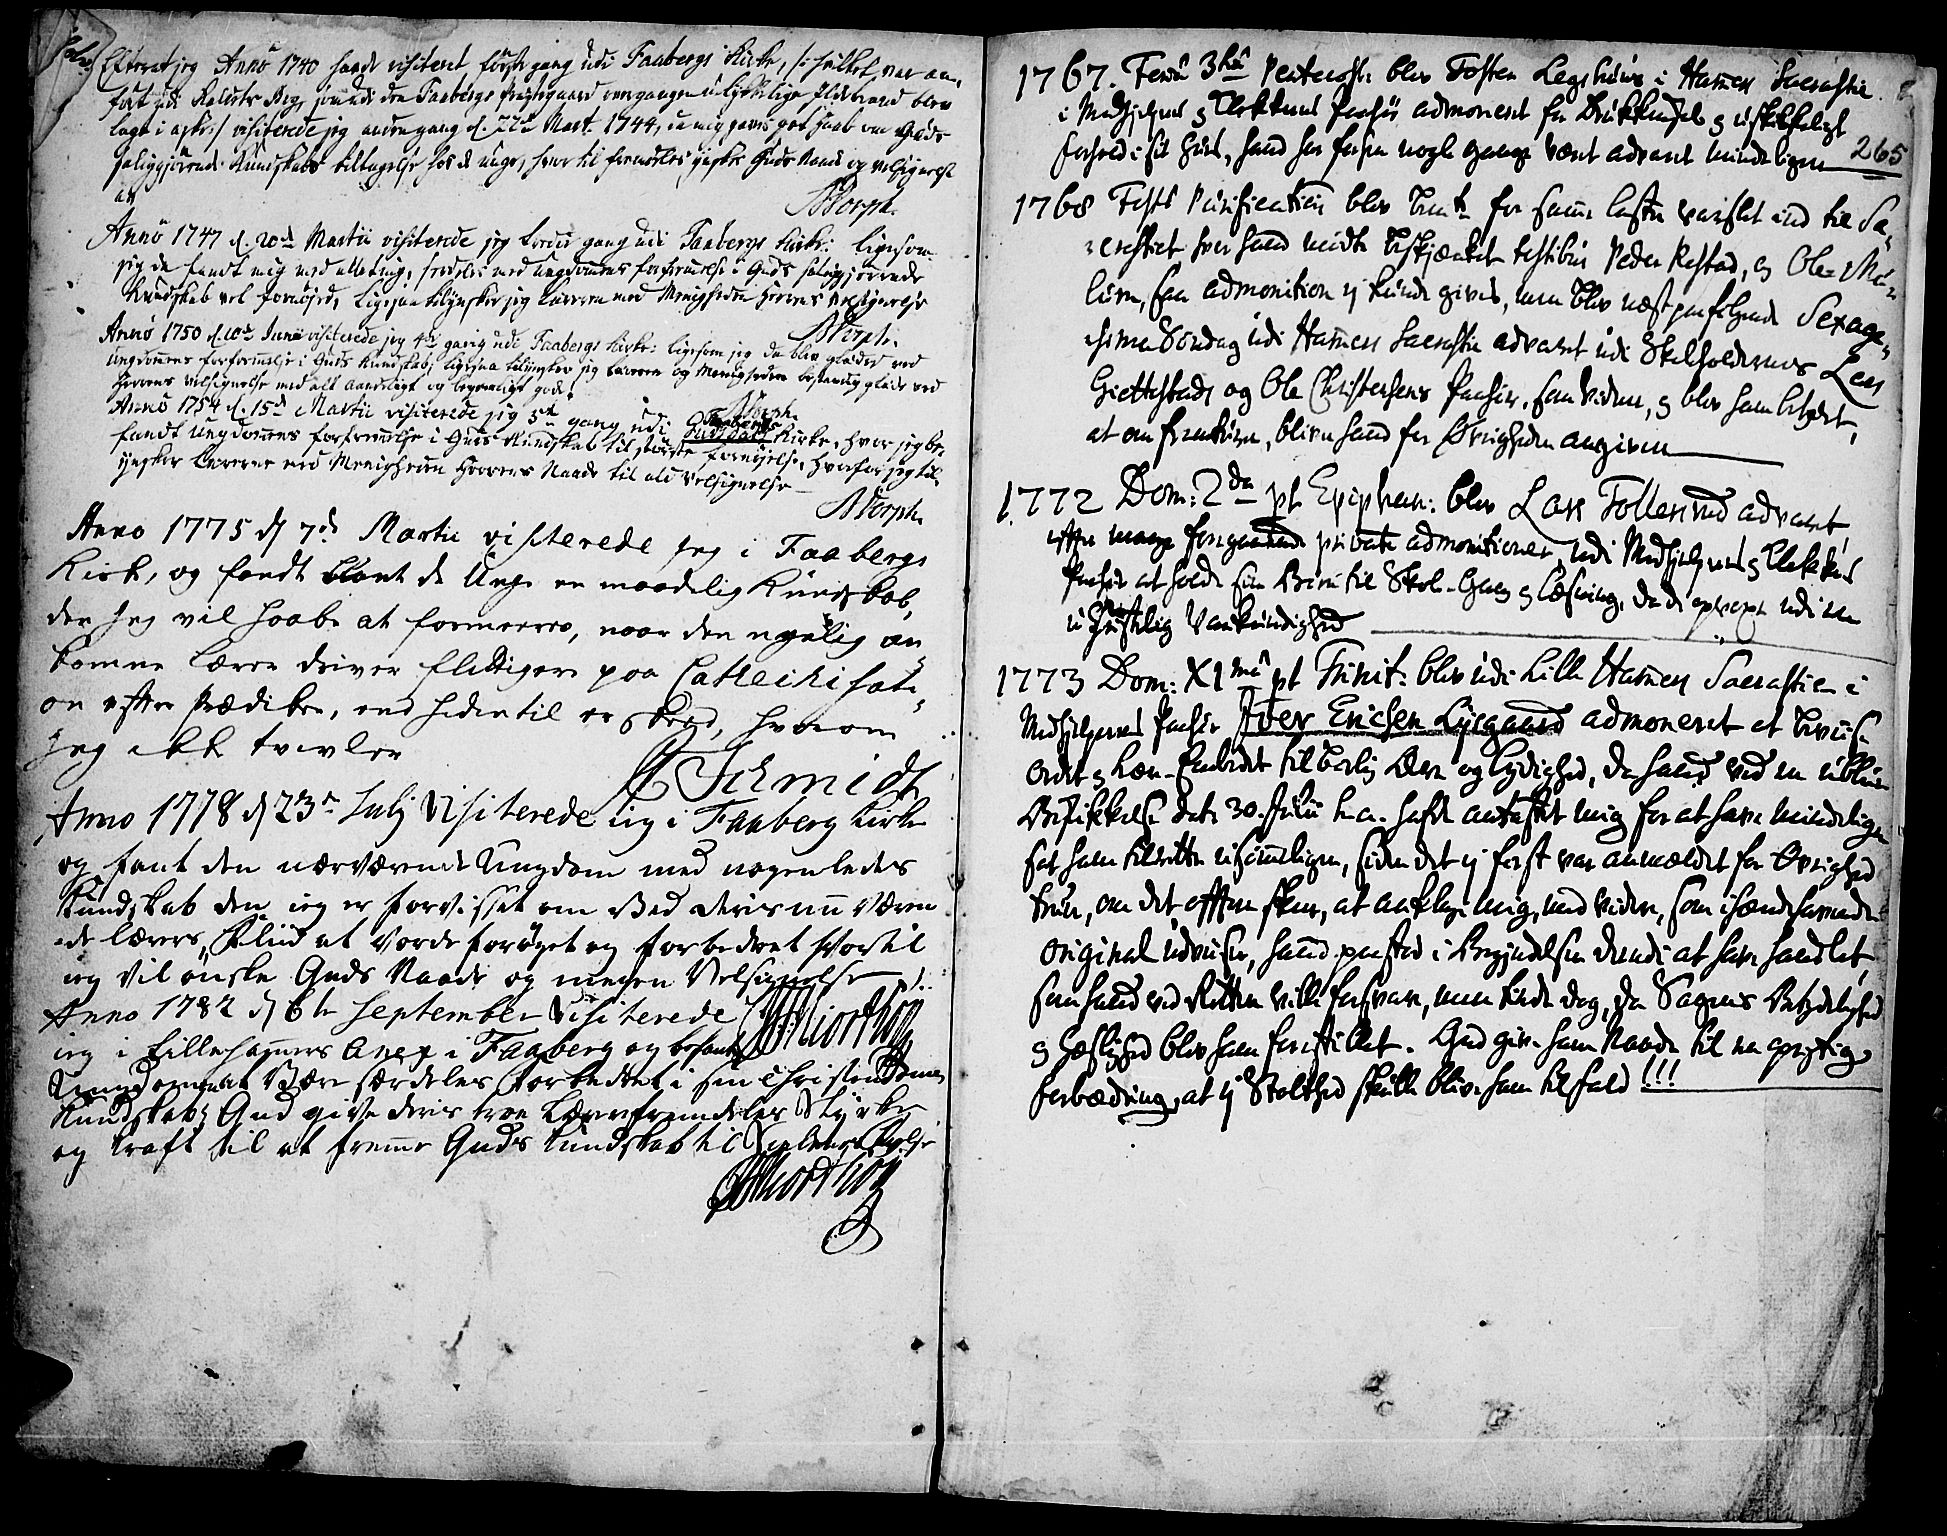 SAH, Fåberg prestekontor, Ministerialbok nr. 1, 1727-1775, s. 265